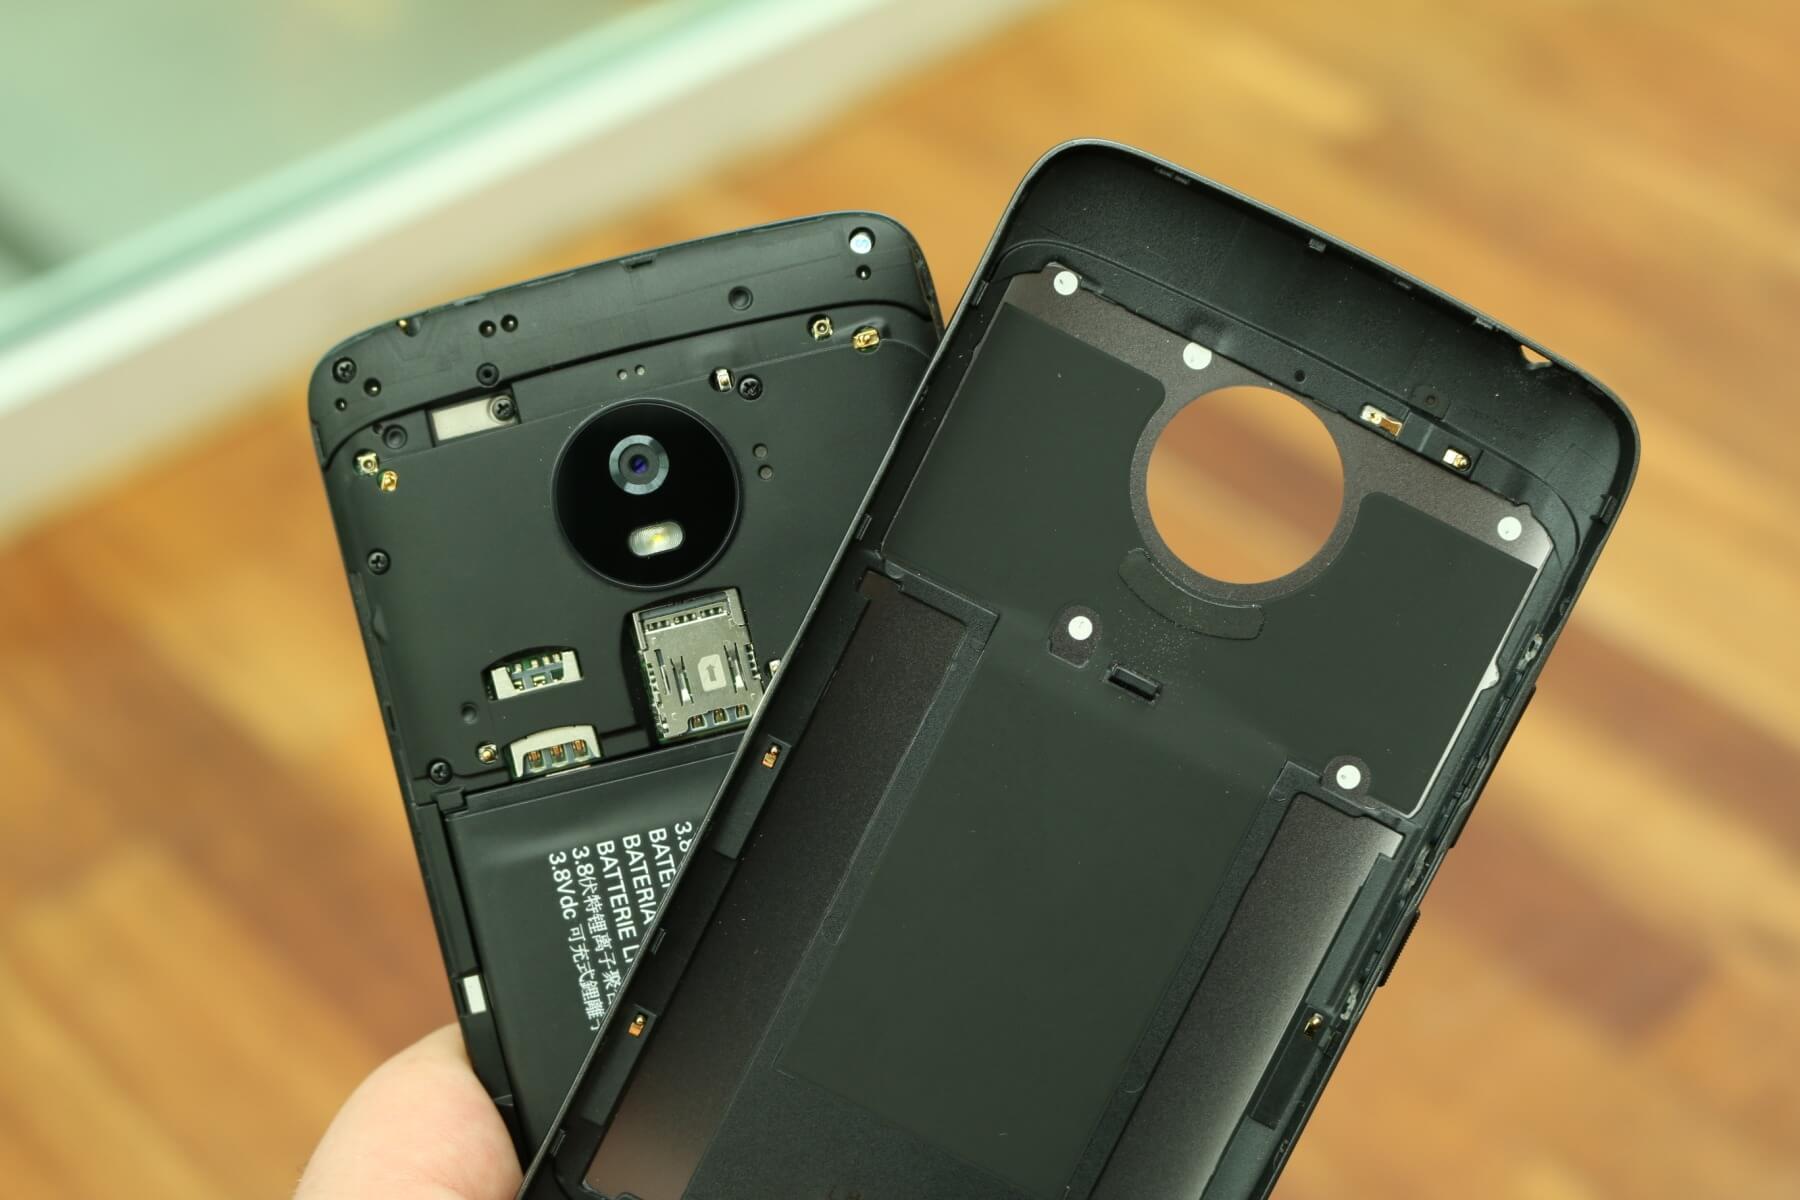 Motorola G5 Sim Karte Einlegen